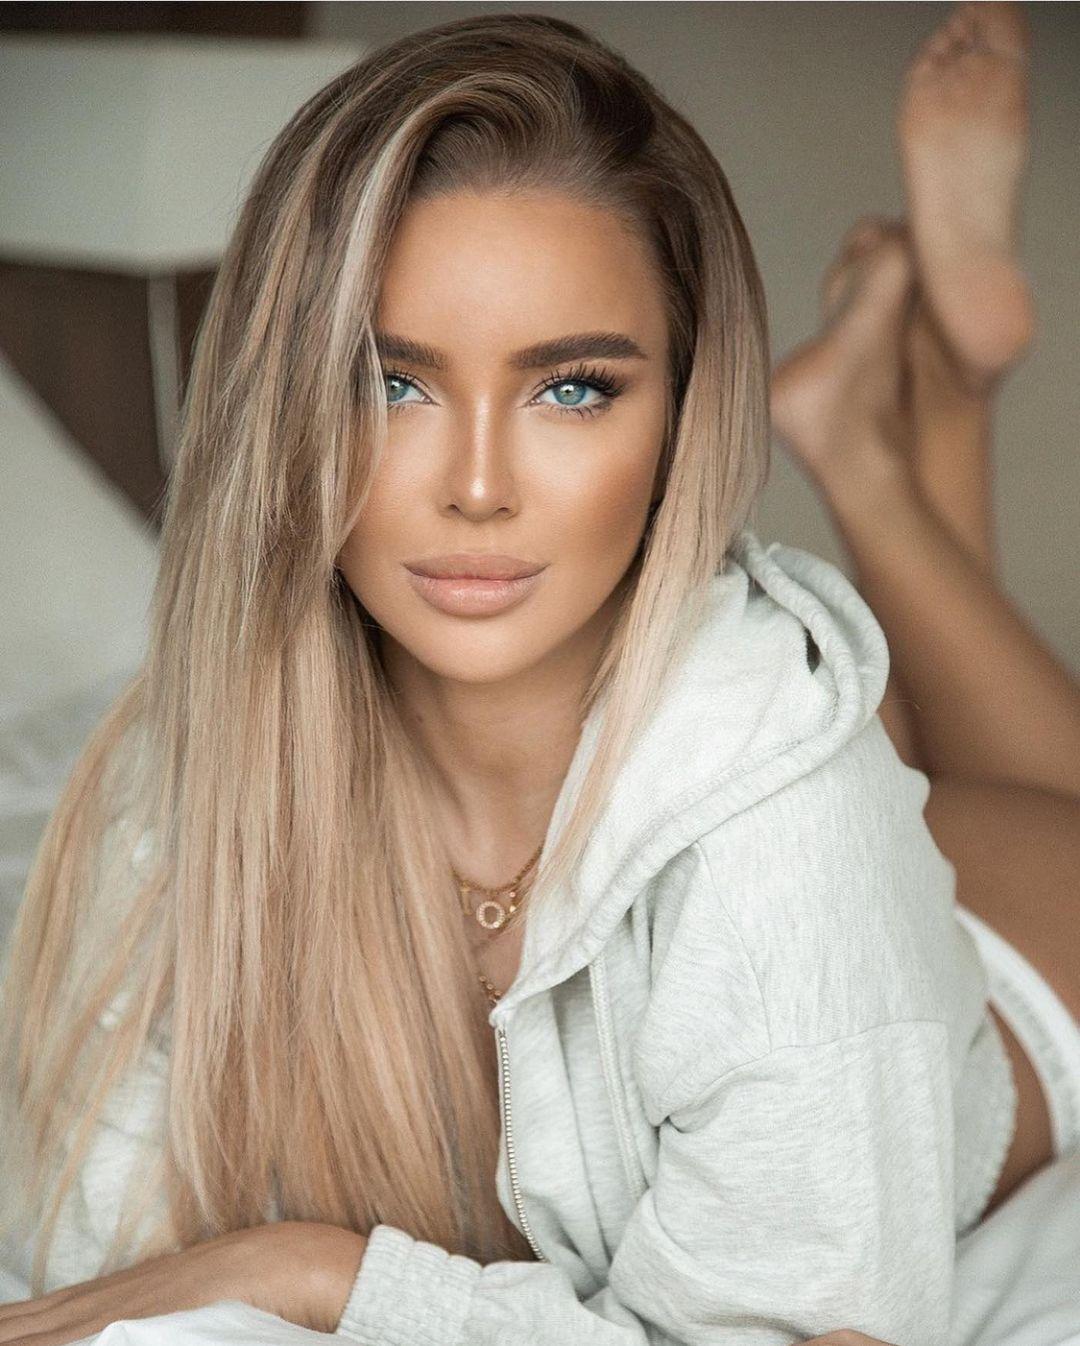 Russian Stylish Girl DP